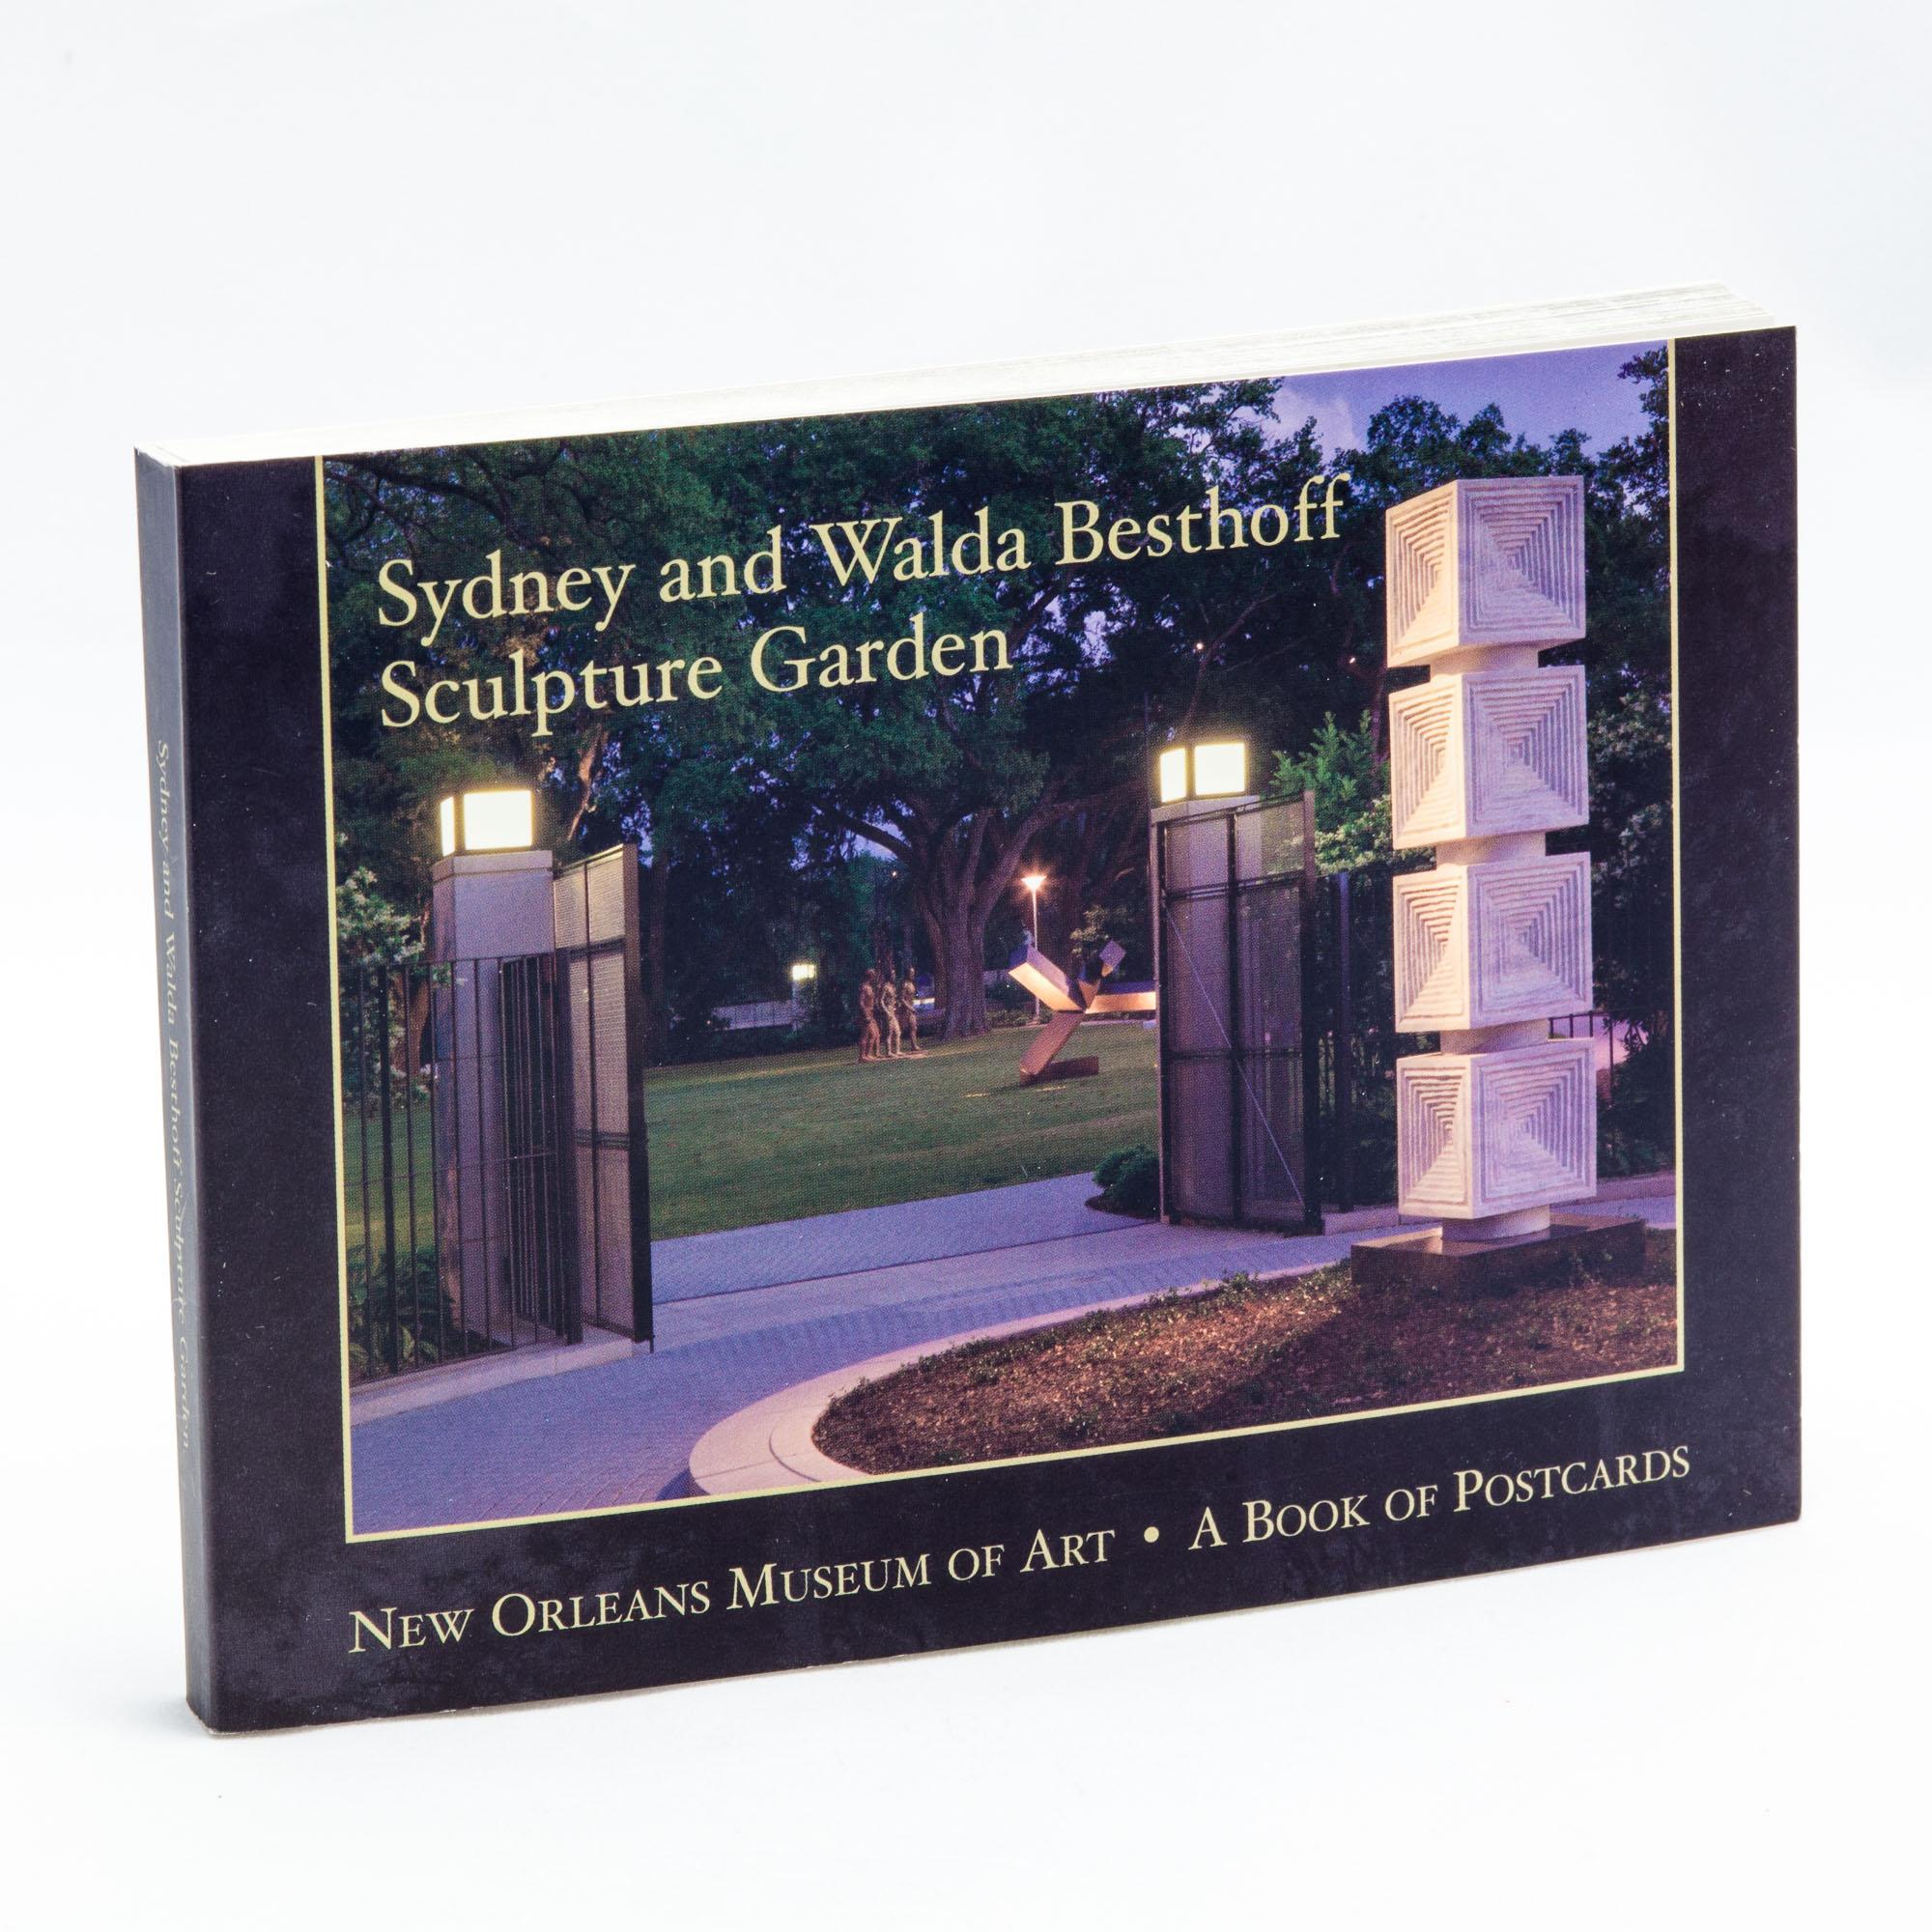 Noma sculpture garden postcards new orleans museum of art - Sydney and walda besthoff sculpture garden ...